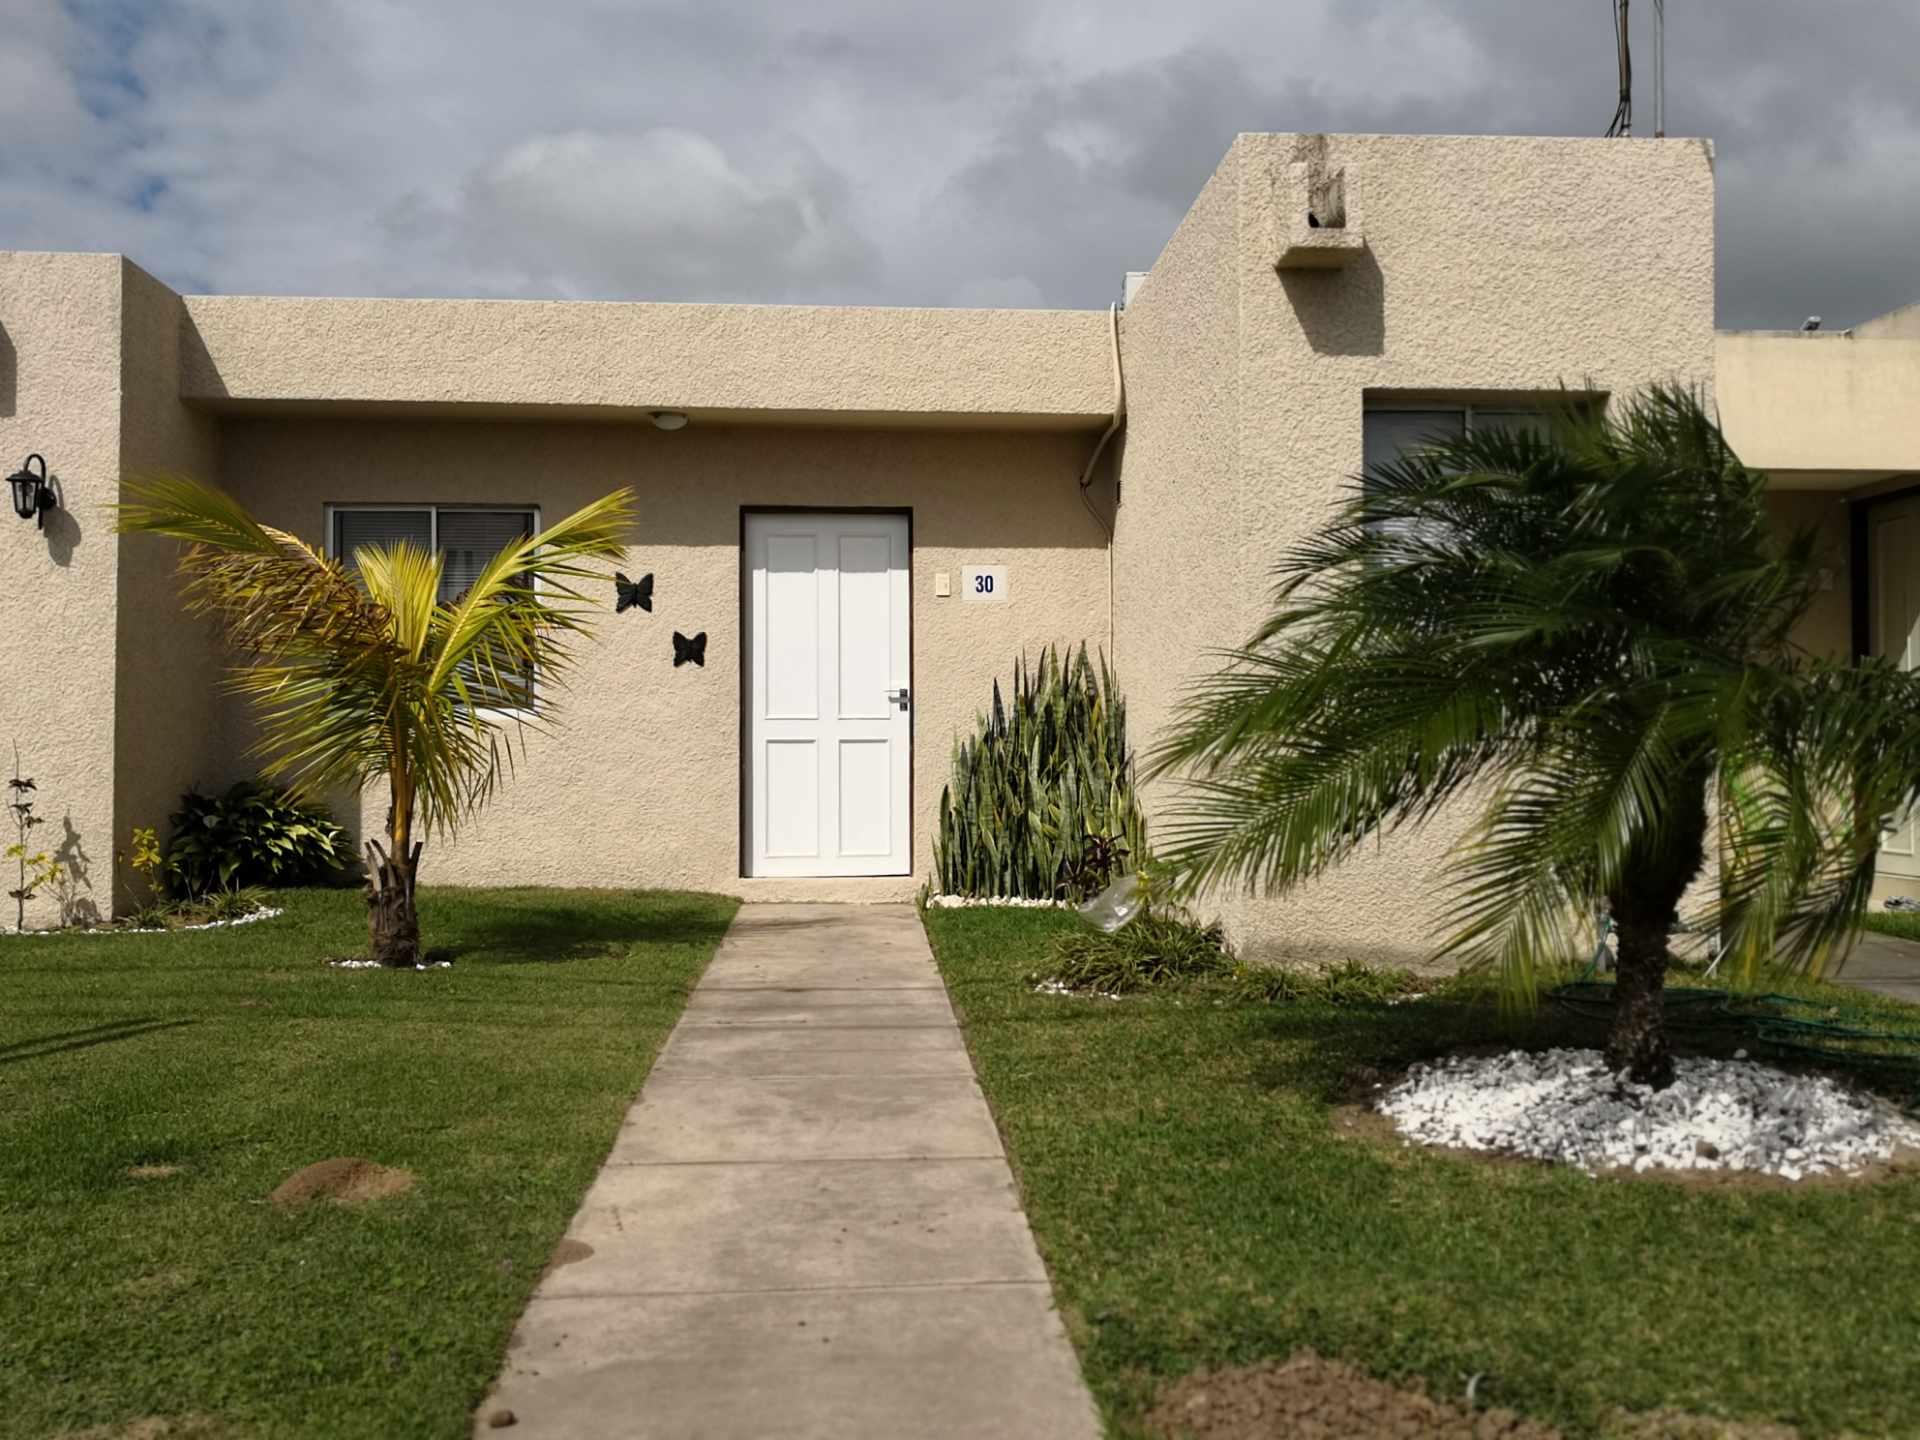 Casa en Alquiler Av. Banzer, km 11 Condominio Sevilla Las Terrazas I Foto 1